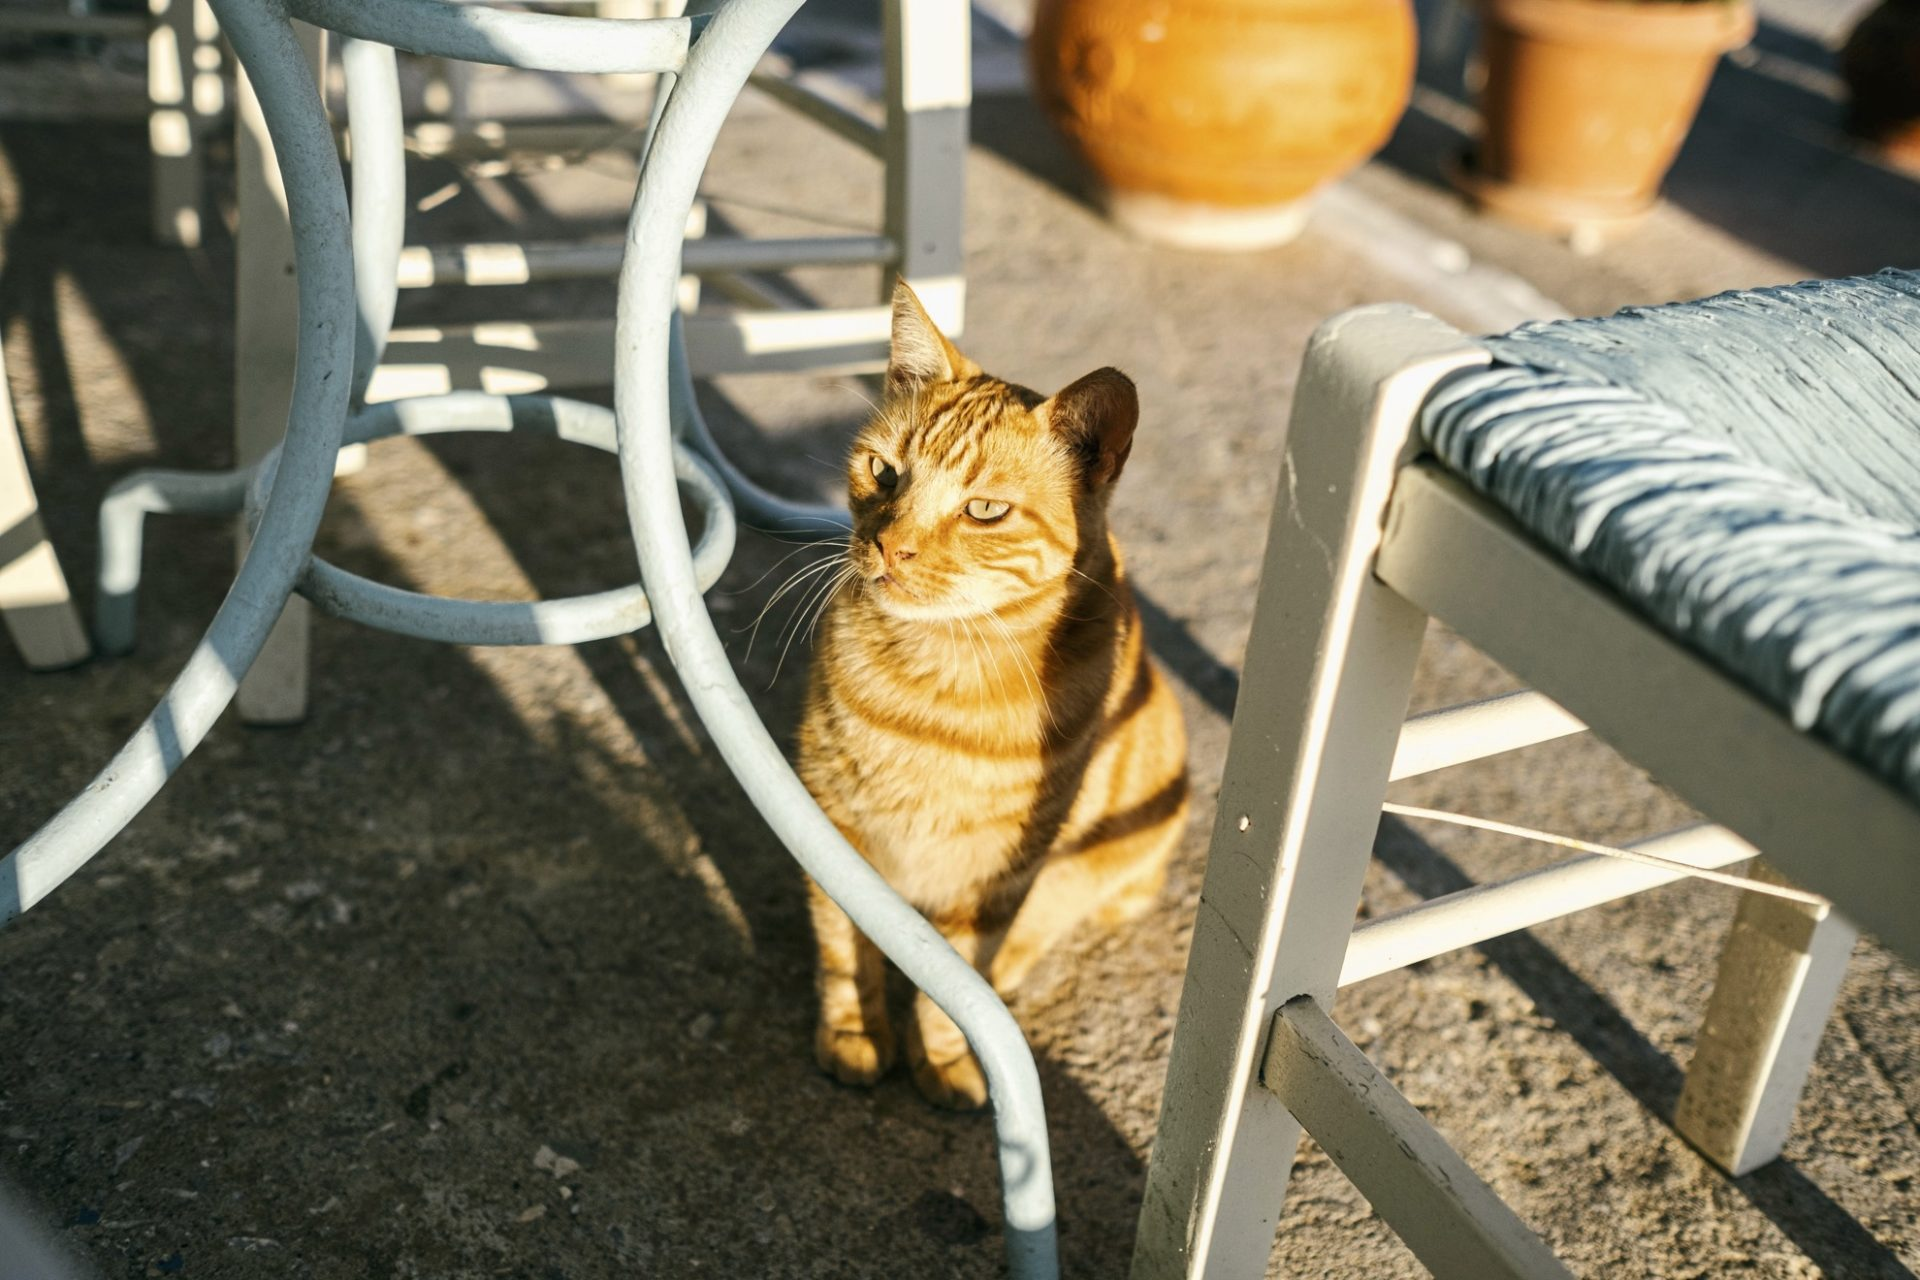 chats grecs@laurentparienti - 11